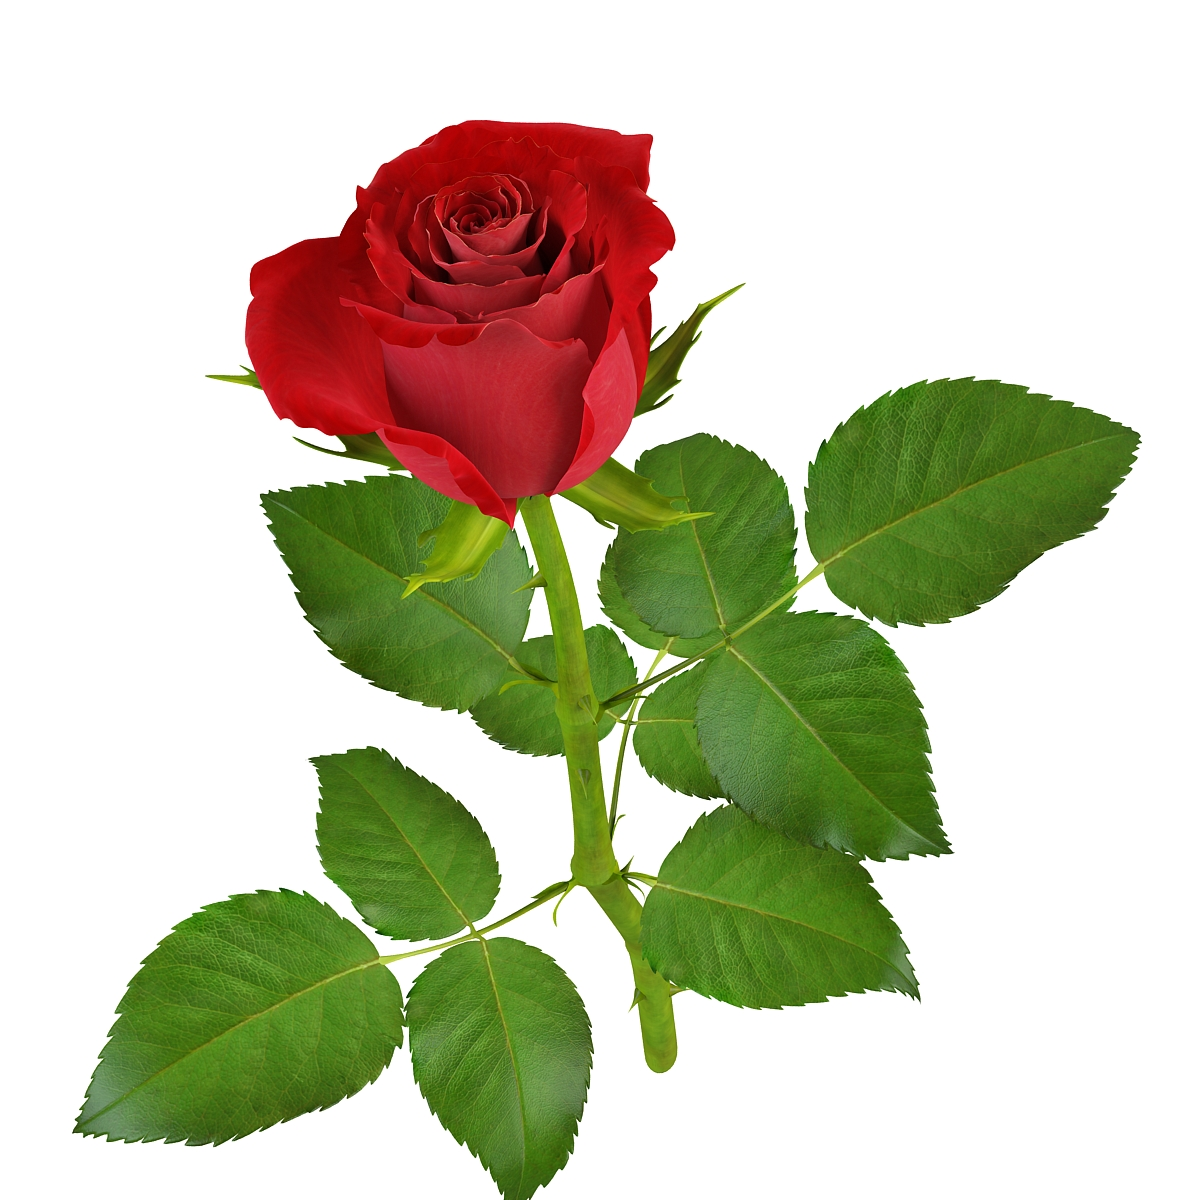 rose11 1 4 - Lovly Red Rose